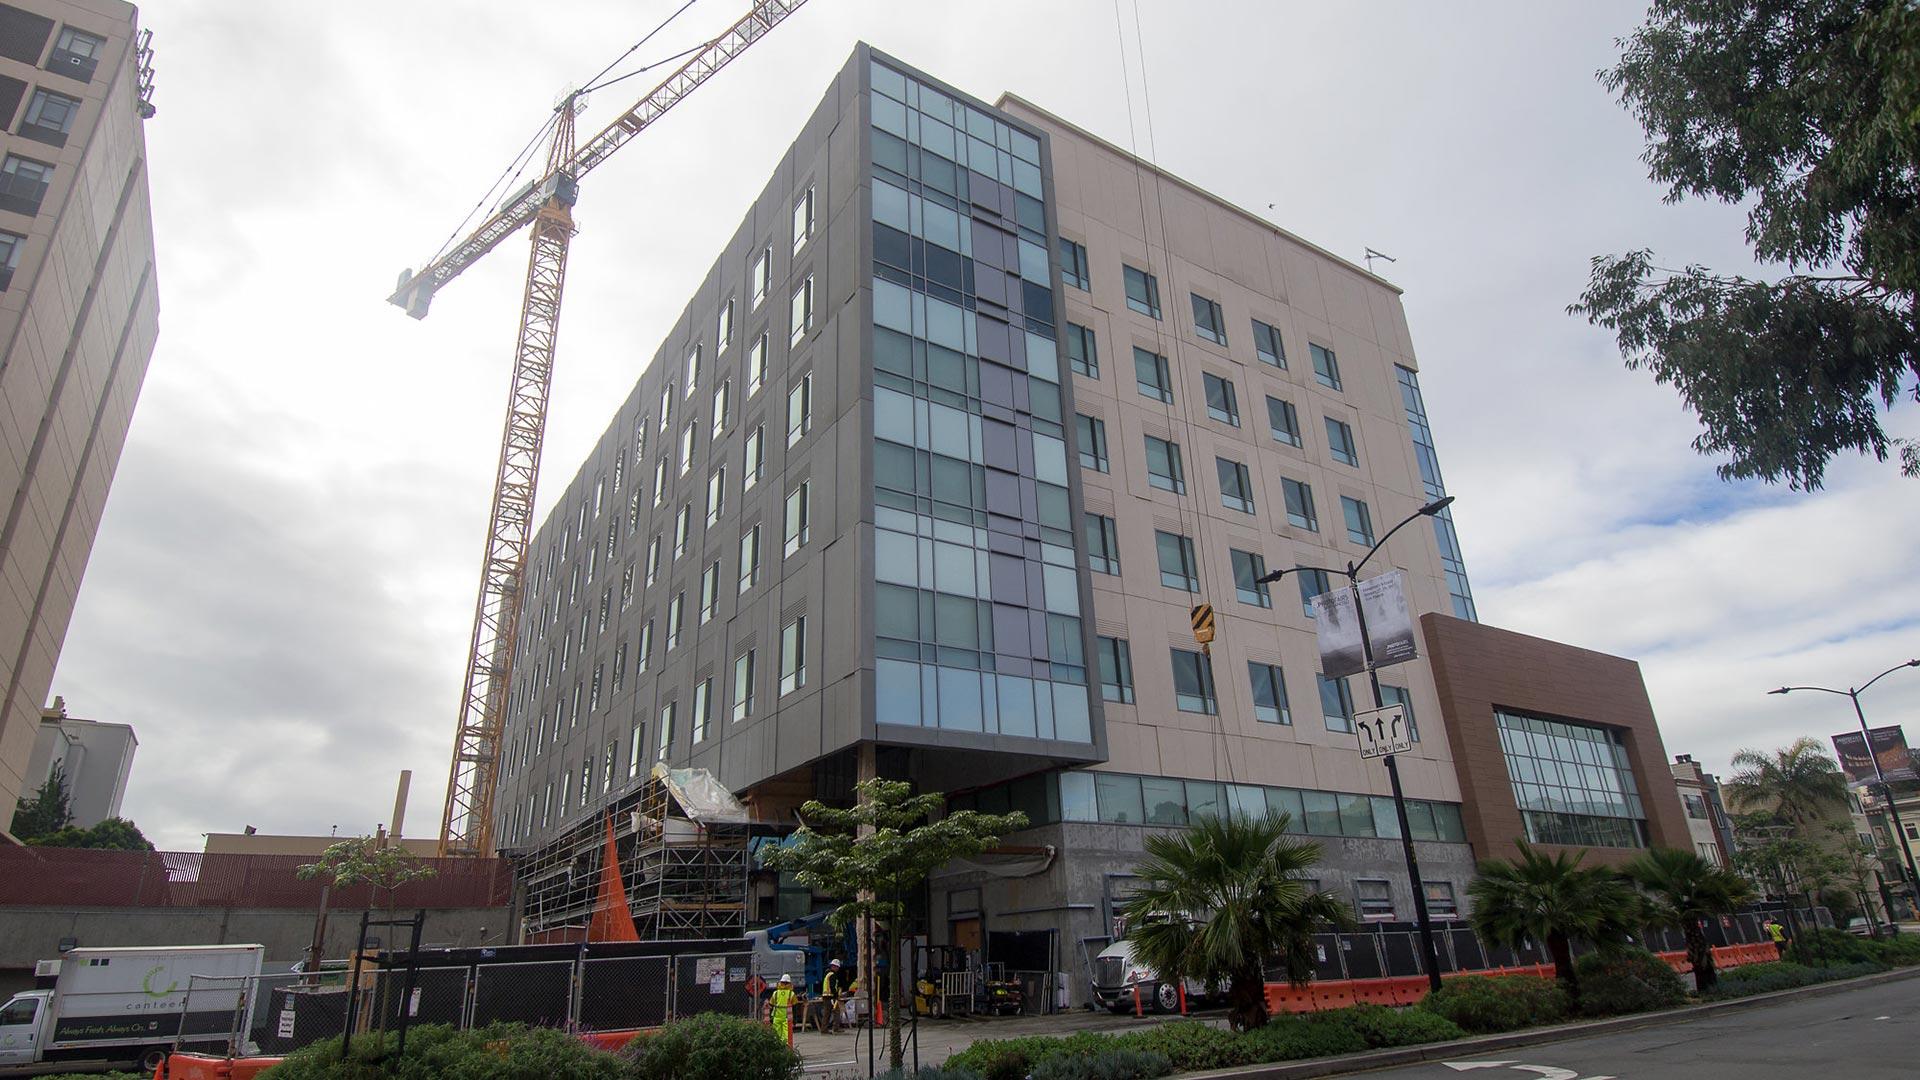 St. Luke's Hospital - San Francisco - Under Construction